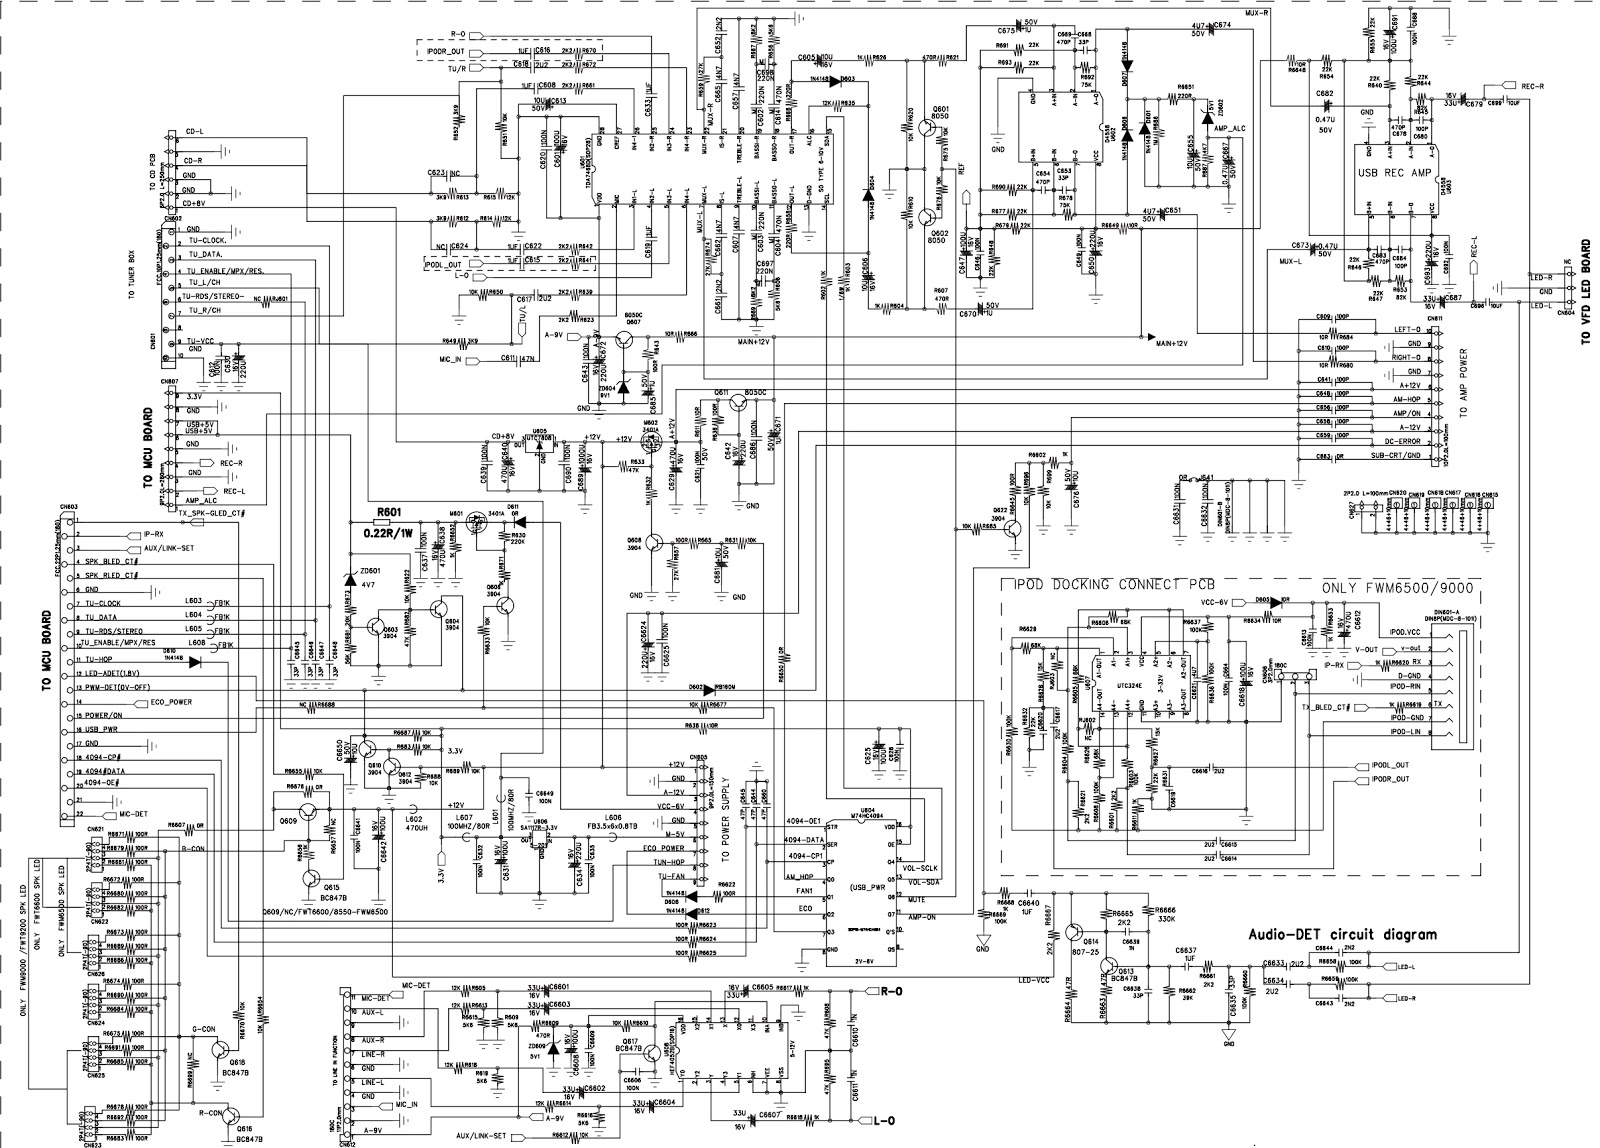 Vizio Tv Input Diagram 01 Dodge Durango Wiring Power Supply Schematics Lcd Service Manual